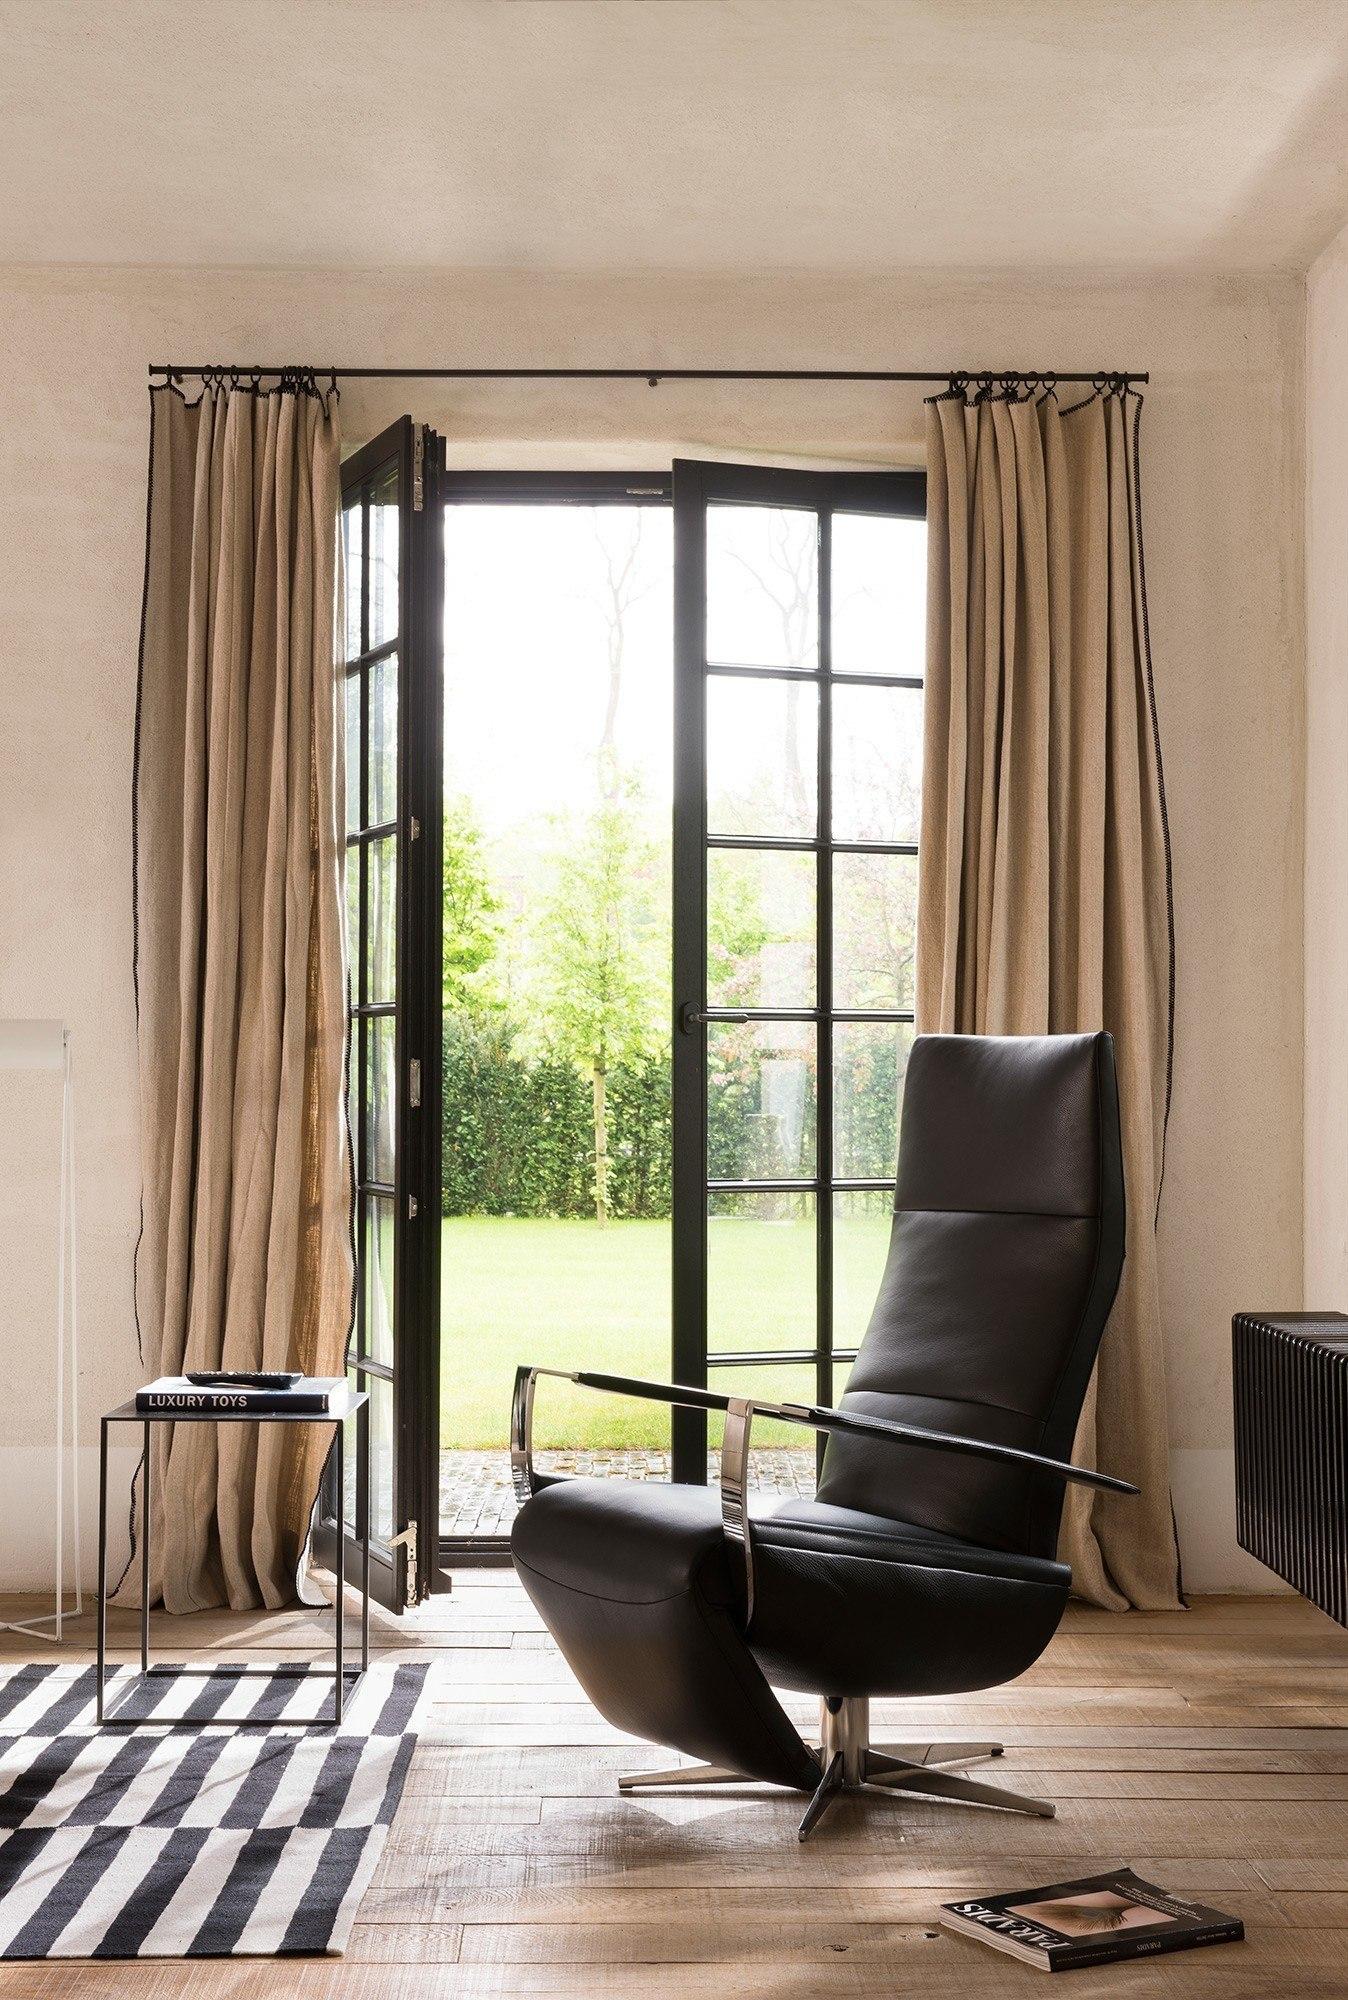 Jori Relax Fauteuil.Fauteuils Design Meubelen Interieur Plus